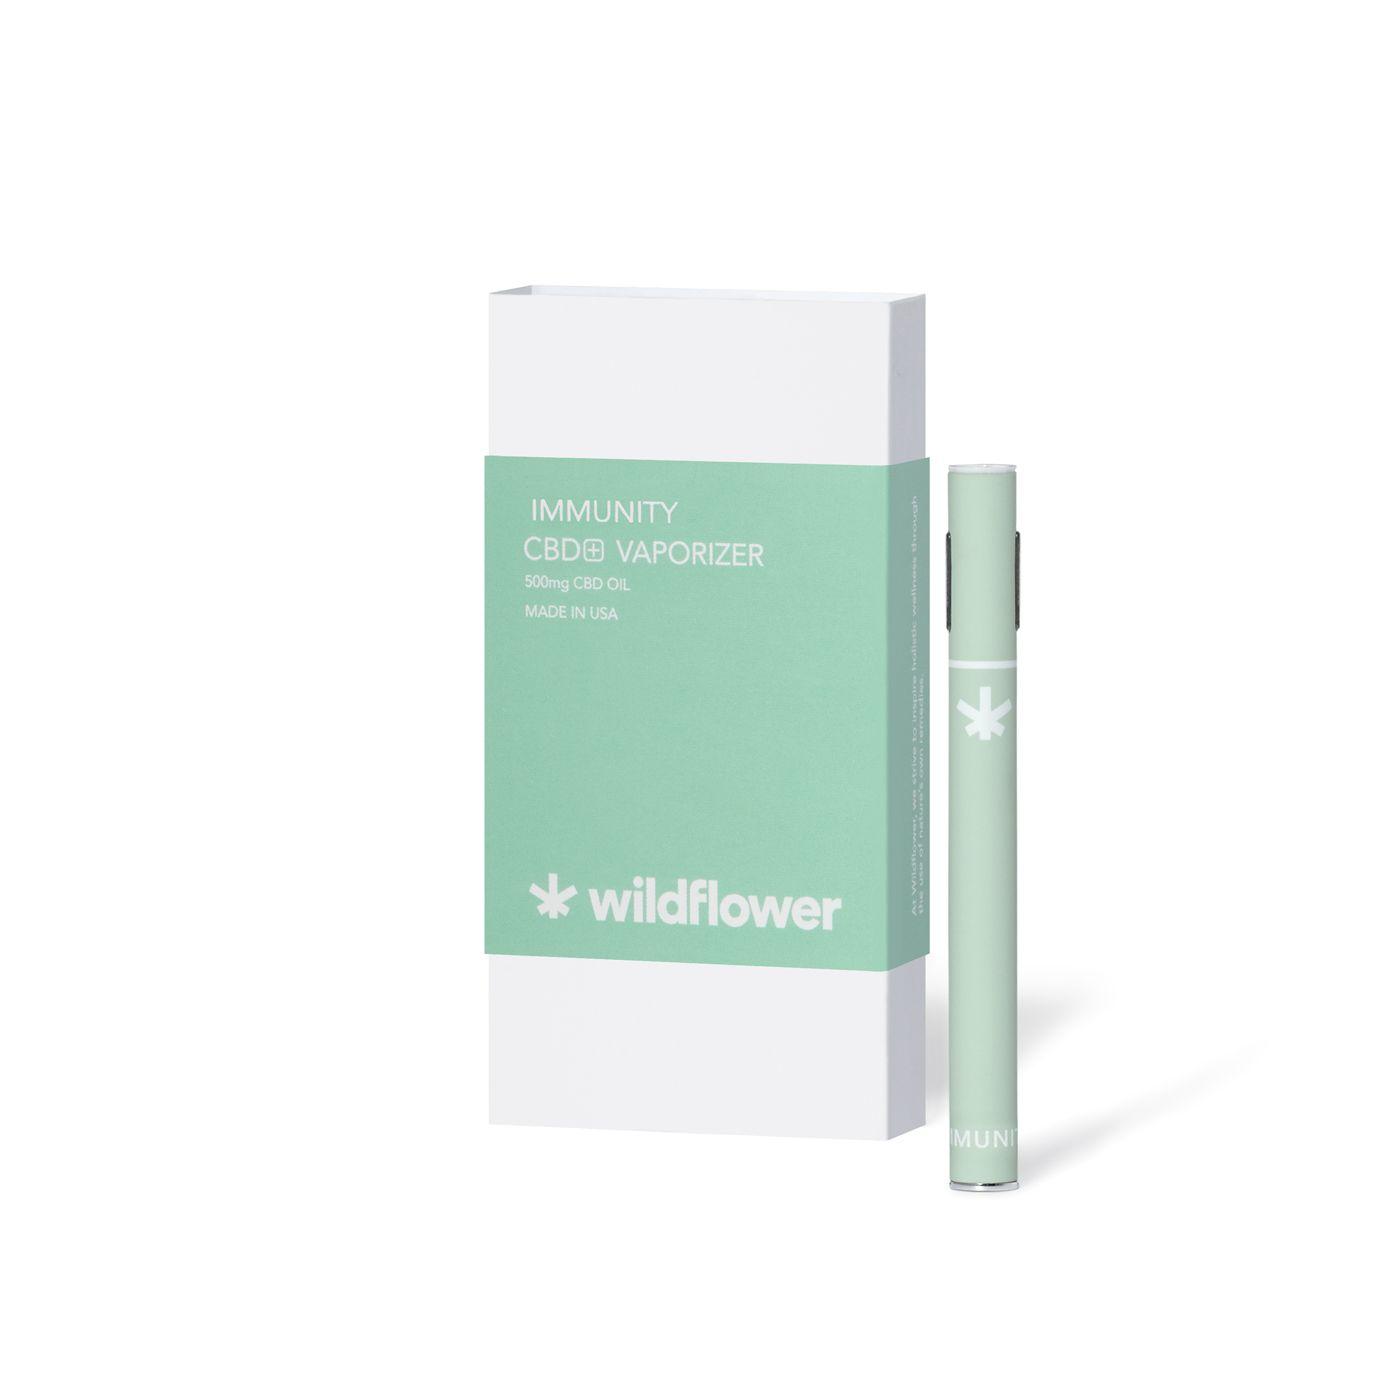 CBD+ Immunity Vaporizer Eucalyptus 300 mg 150 Inhalations